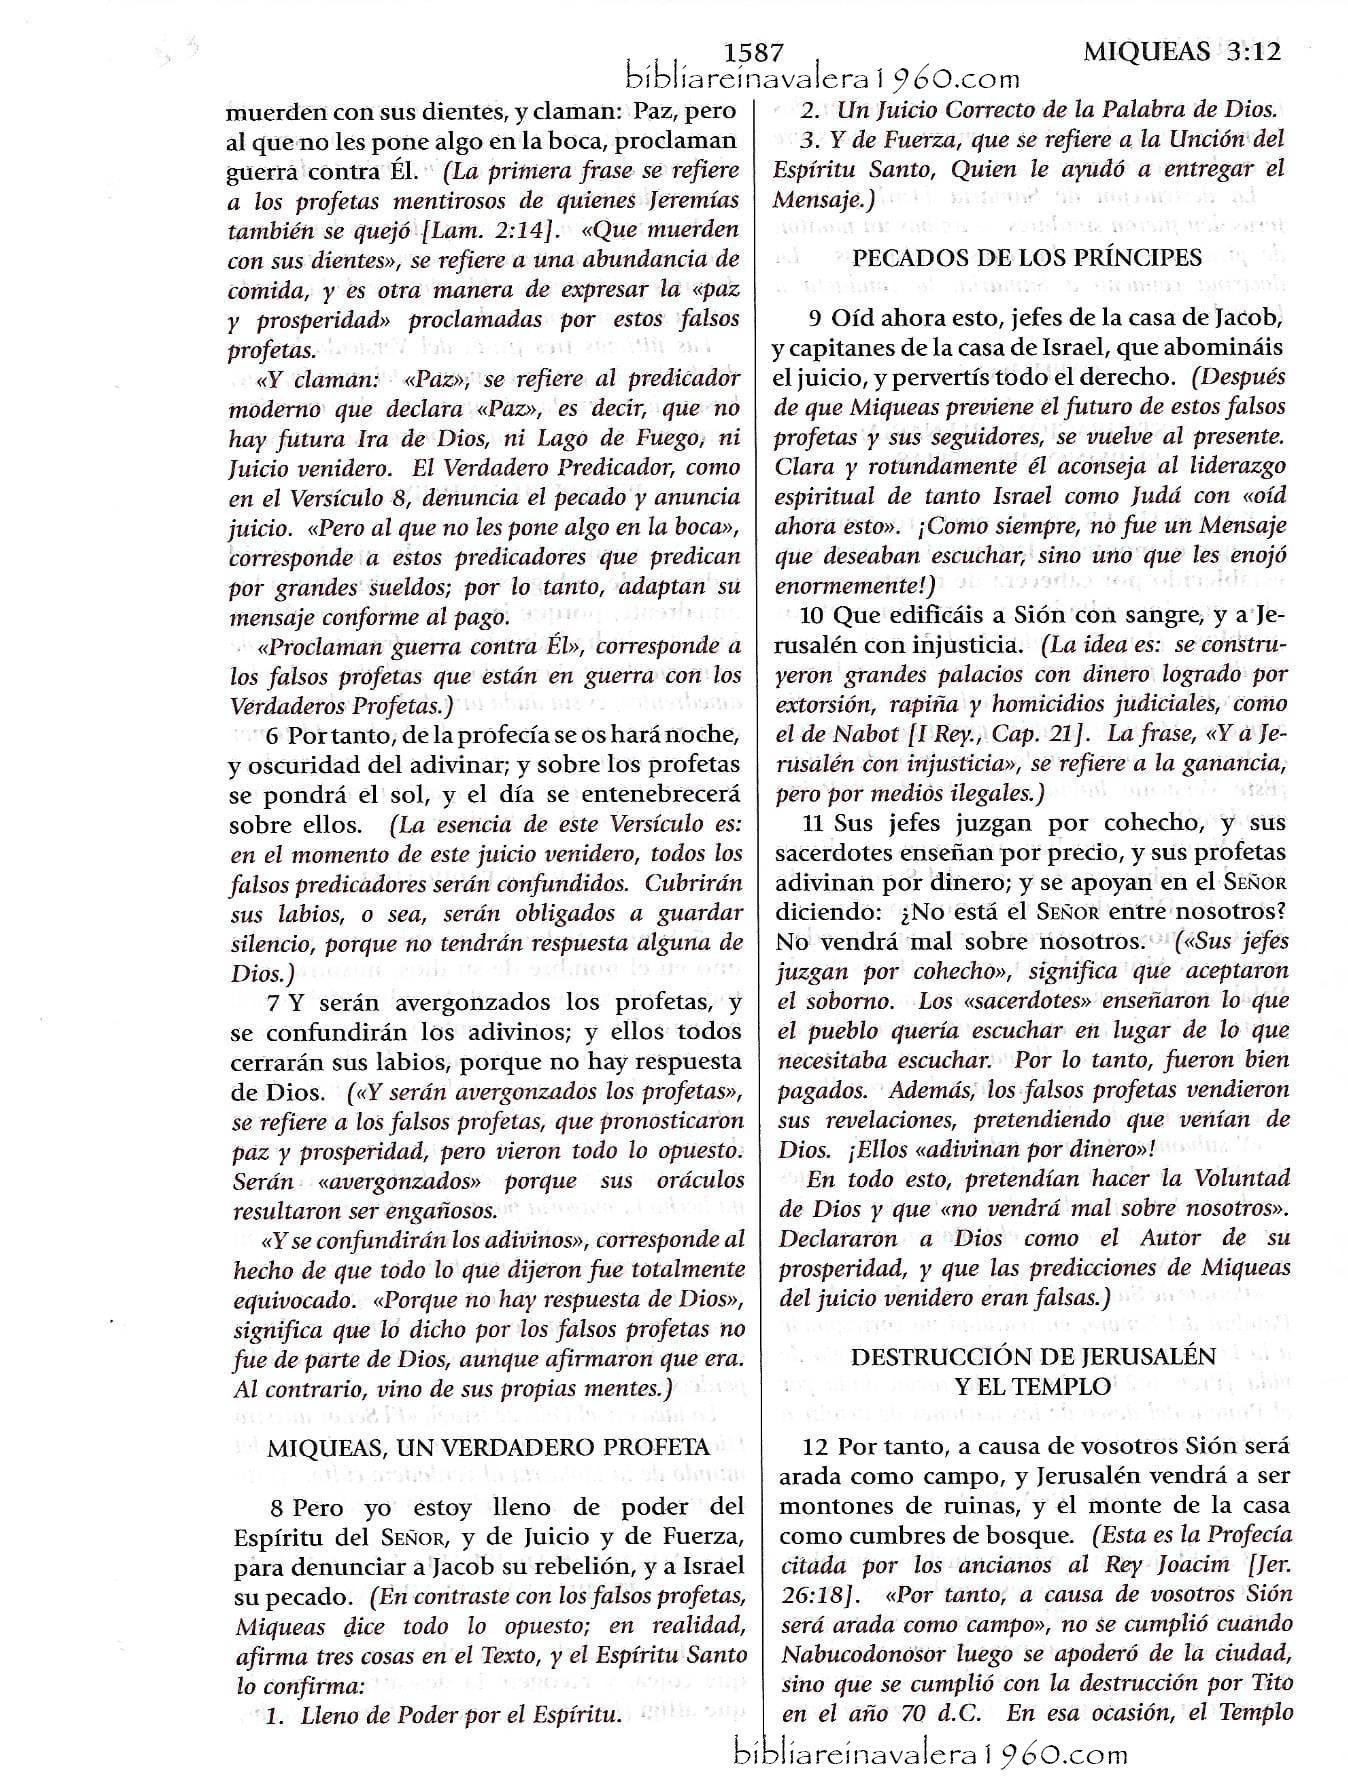 miqueas 3 explicacion 1587